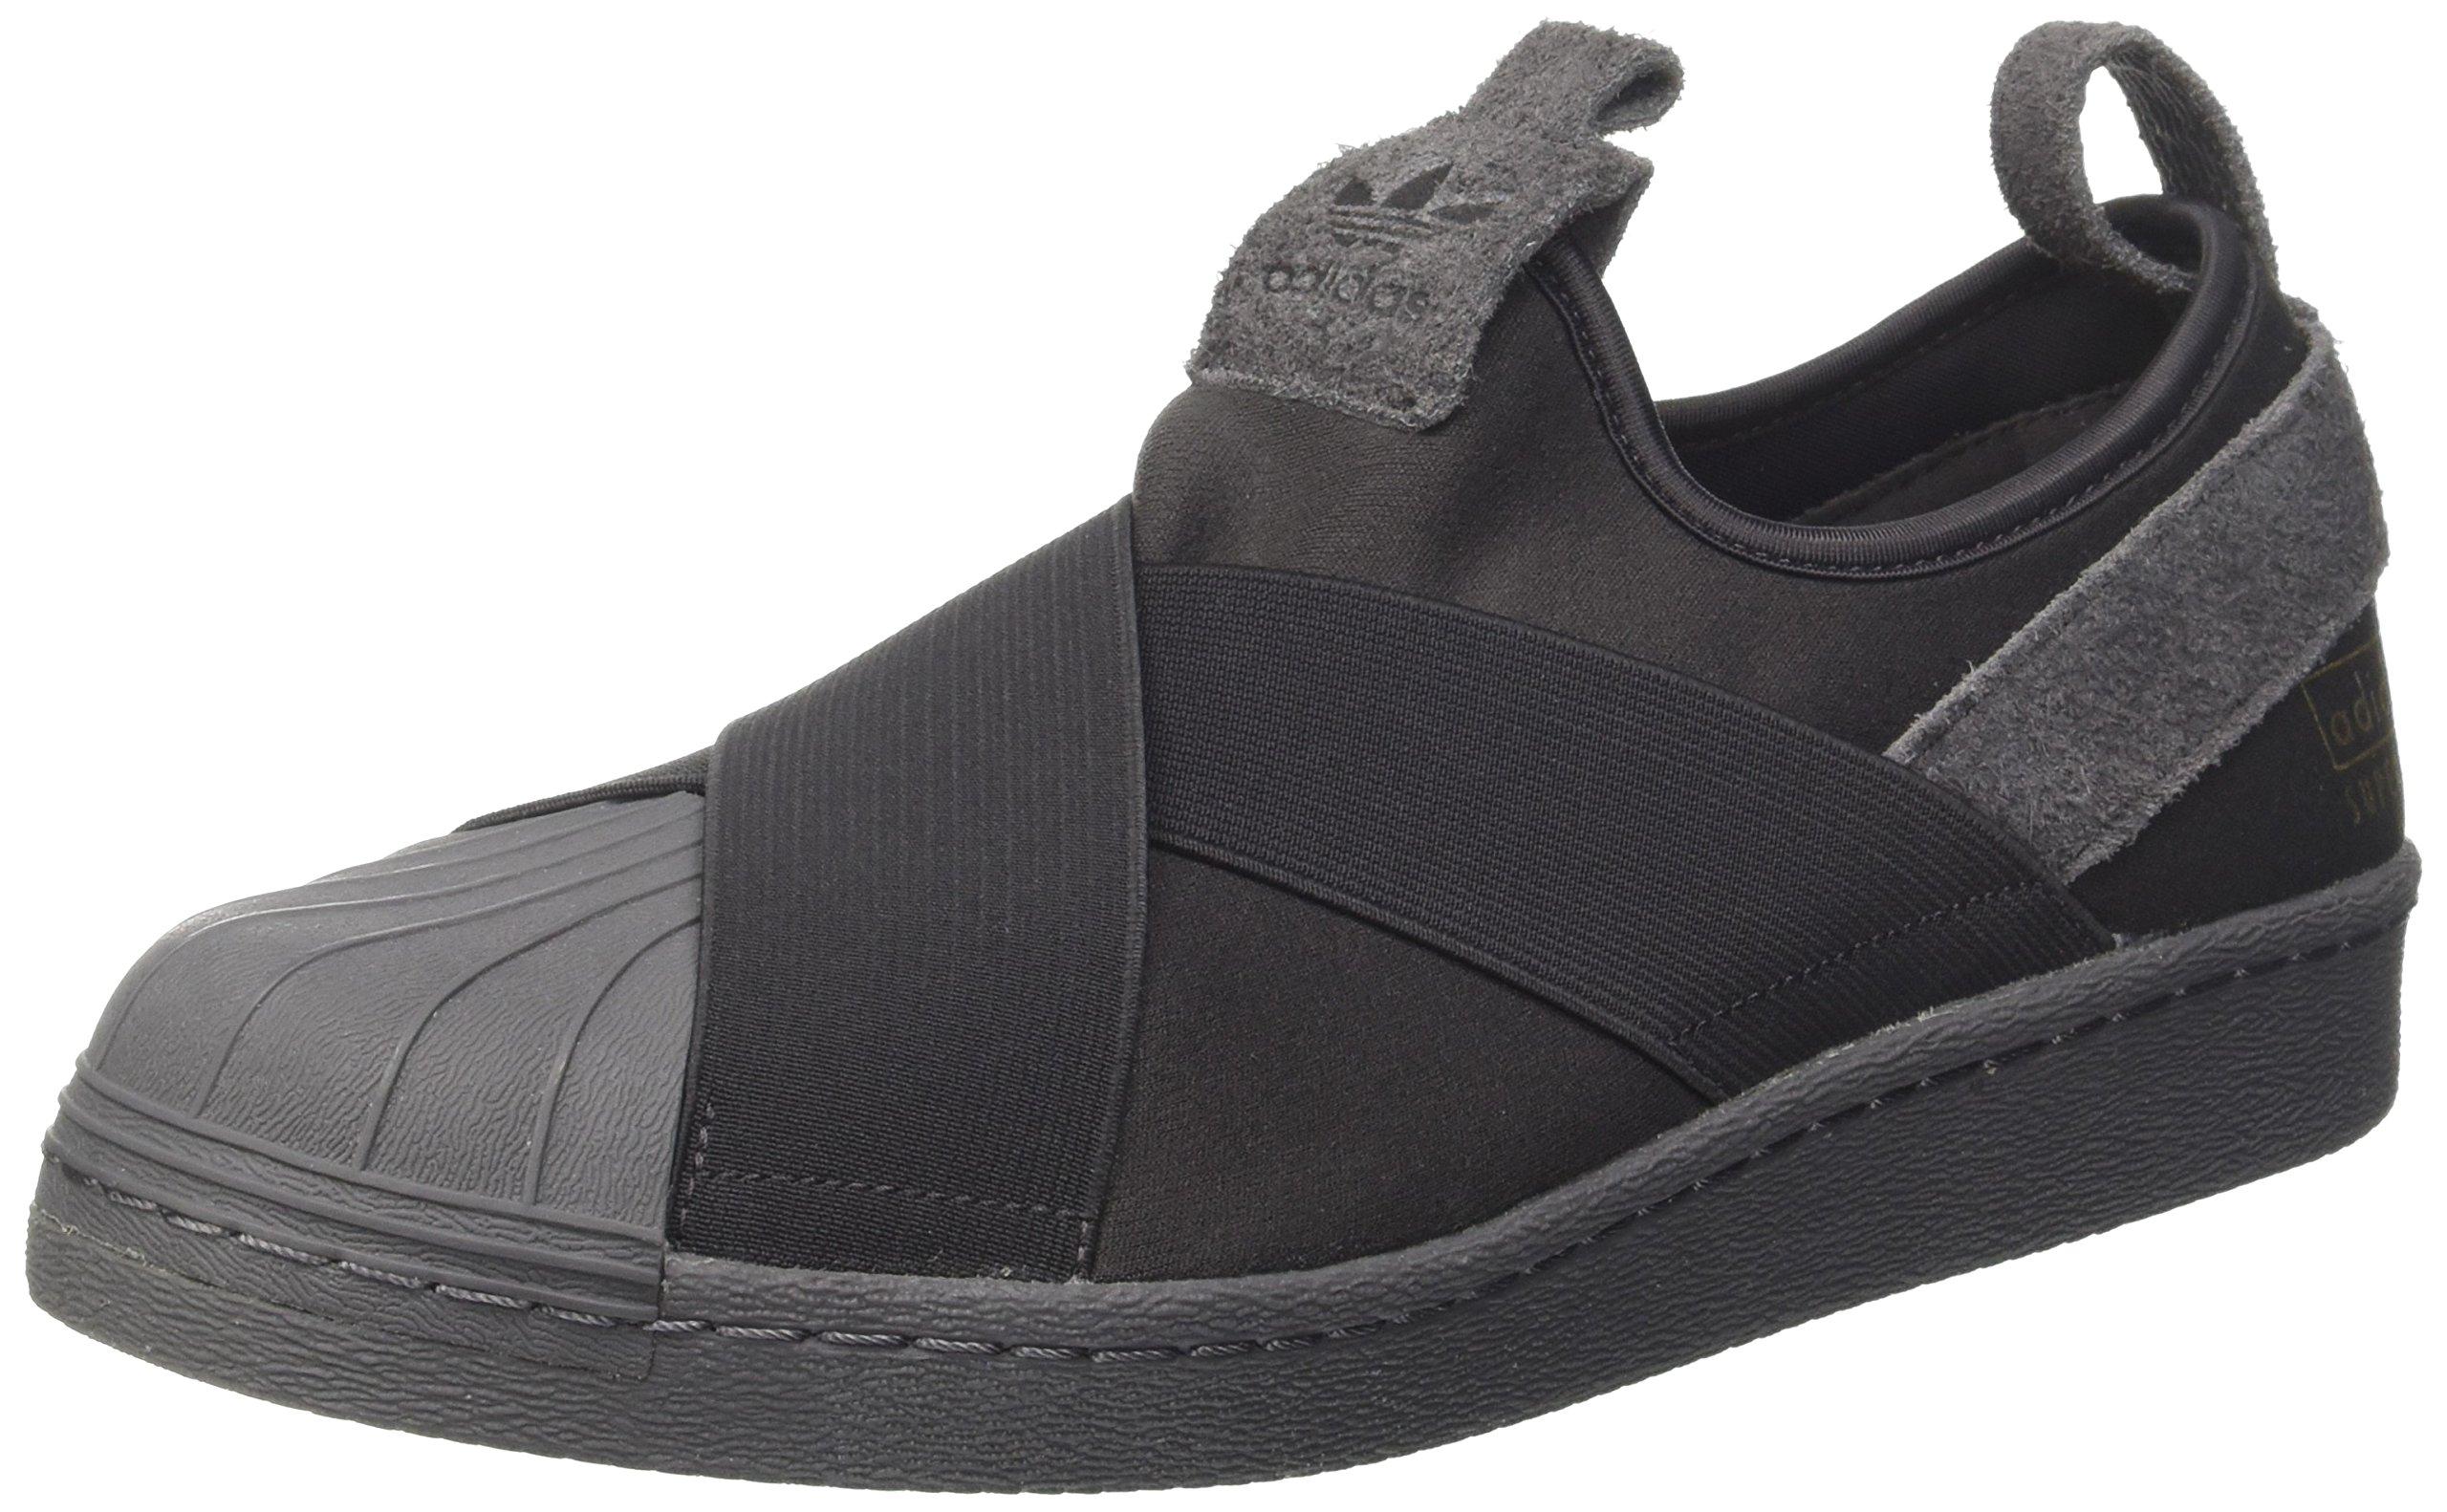 537c5b77439e86 ... Shoes Core Black White Stripe AC8582 8.5.  89.99. adidas Originals  Superstar Slip On Mens Trainers Sneakers (UK 9 US 9.5 EU 43 1